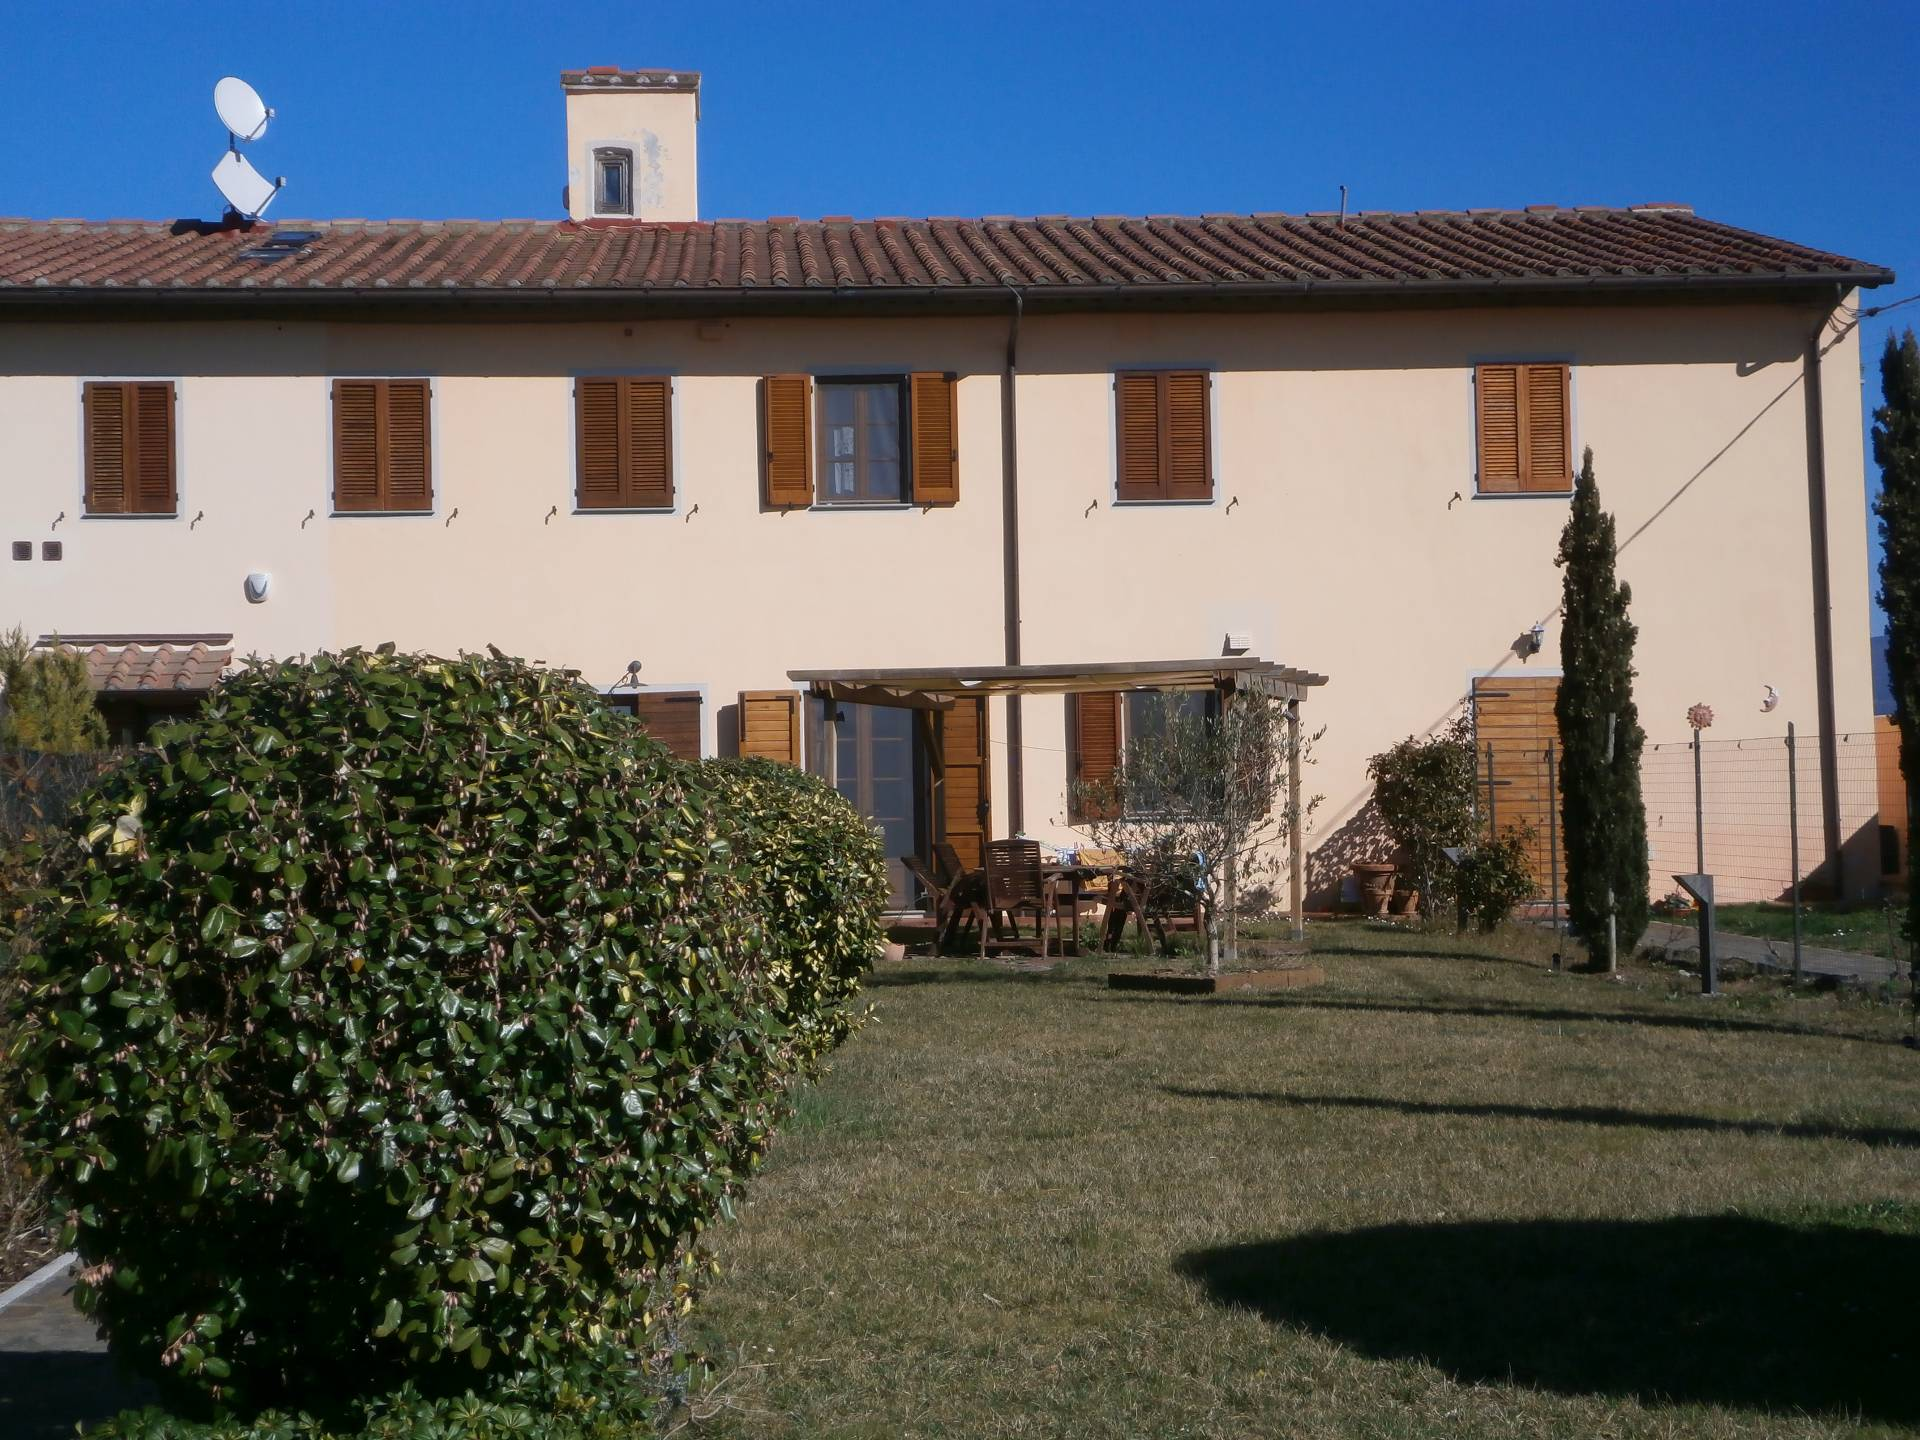 Agriturismo in Vendita a Pisa